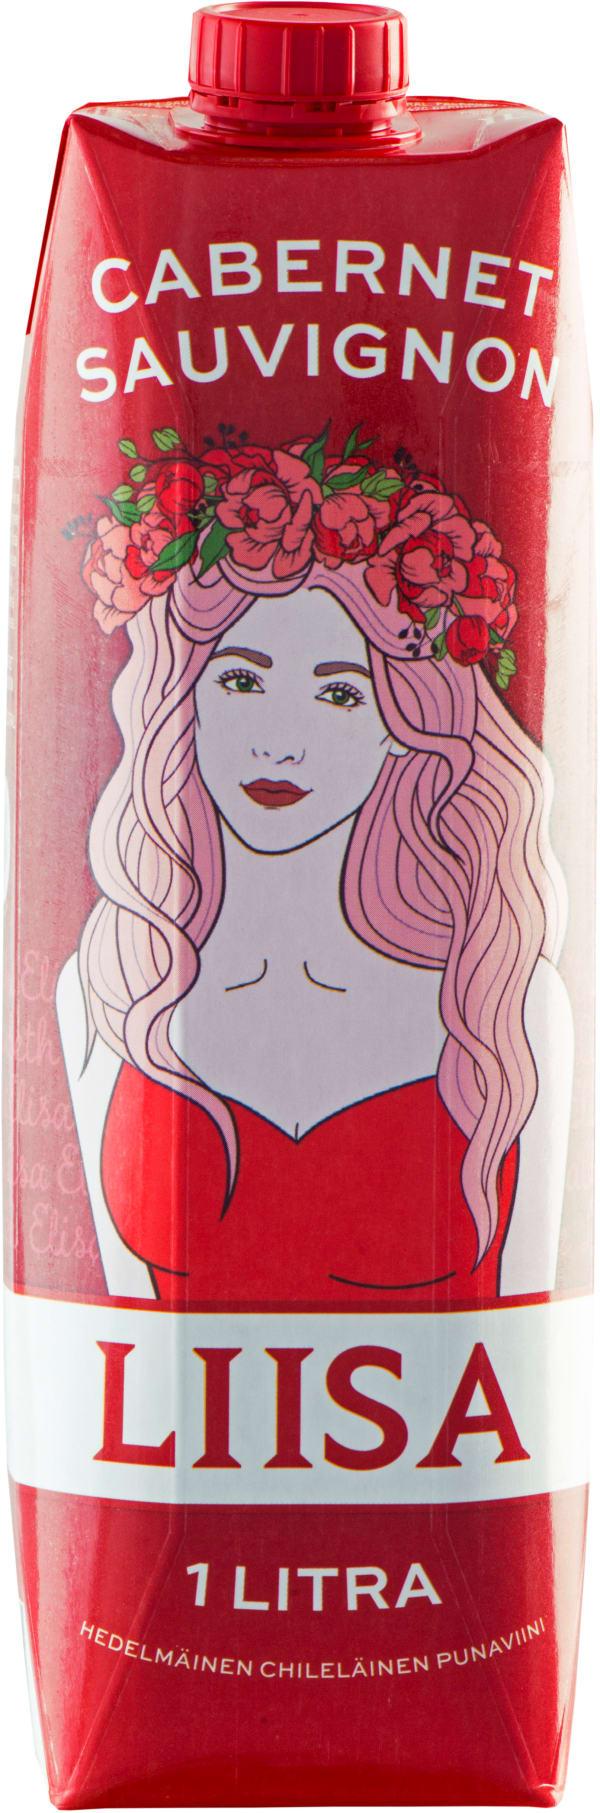 Liisa Cabernet Sauvignon kartongförpackning